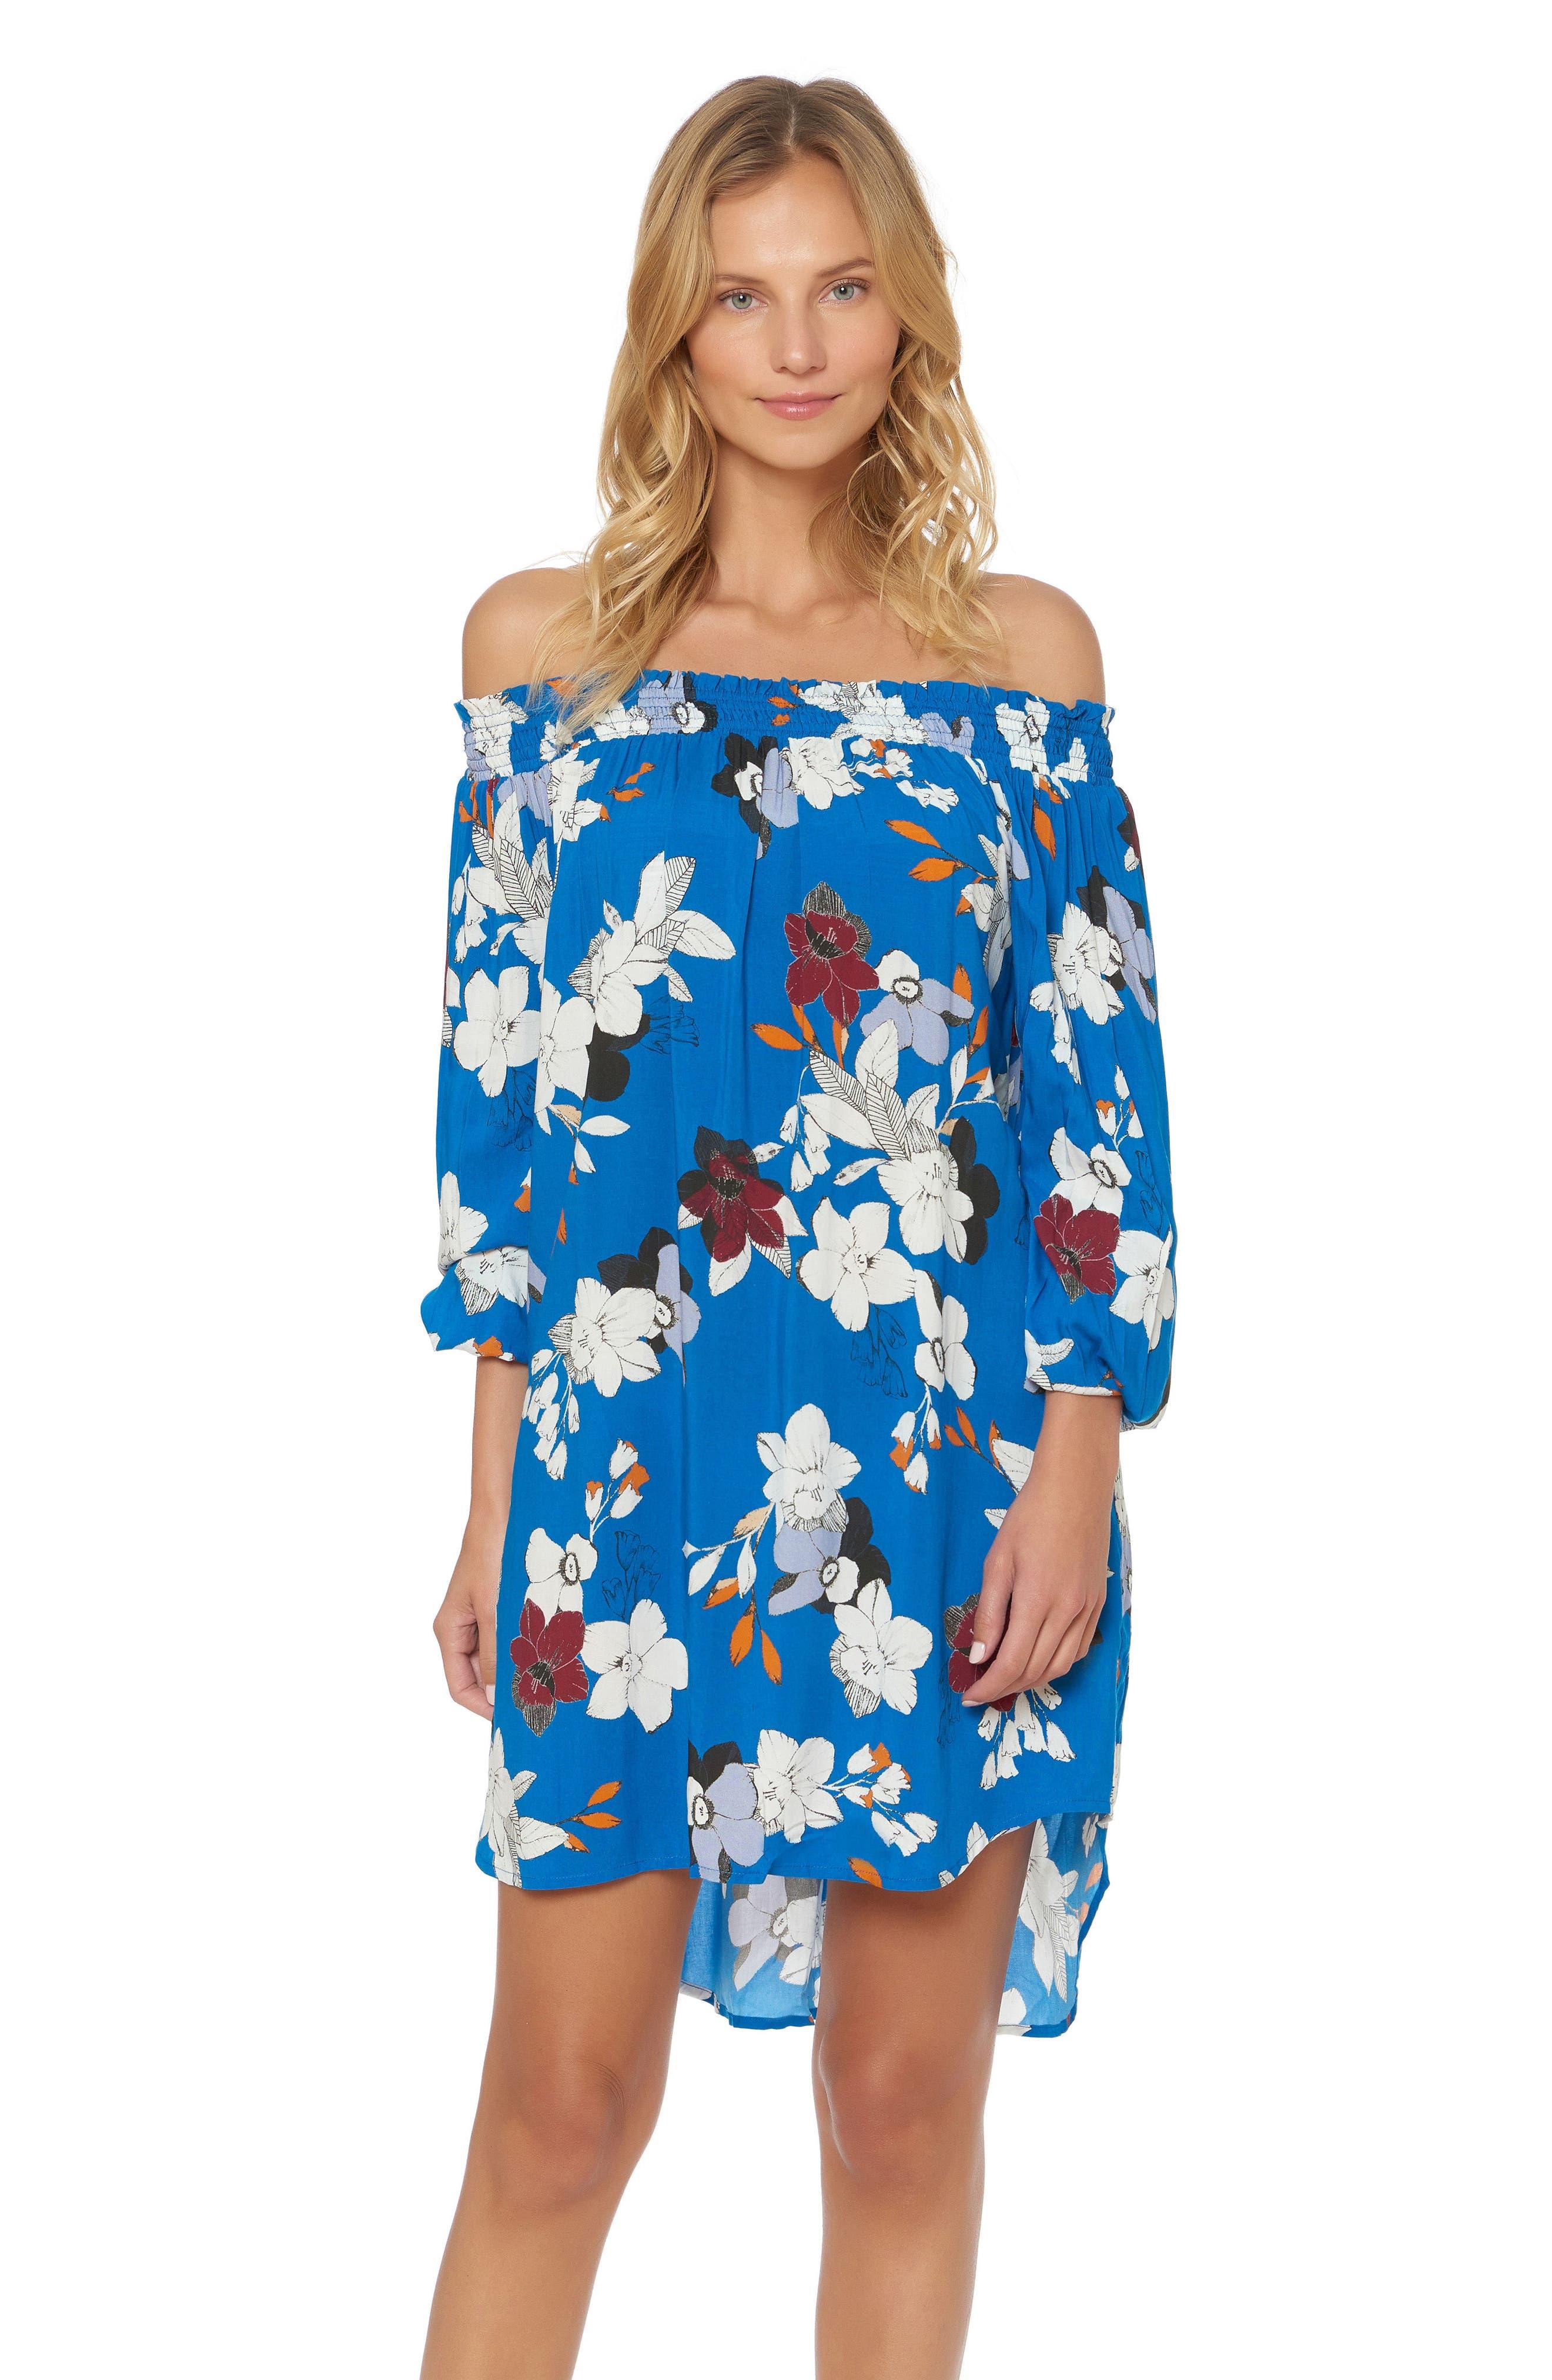 Floral Off the Shoulder Cover-Up Dress,                             Alternate thumbnail 3, color,                             VISION